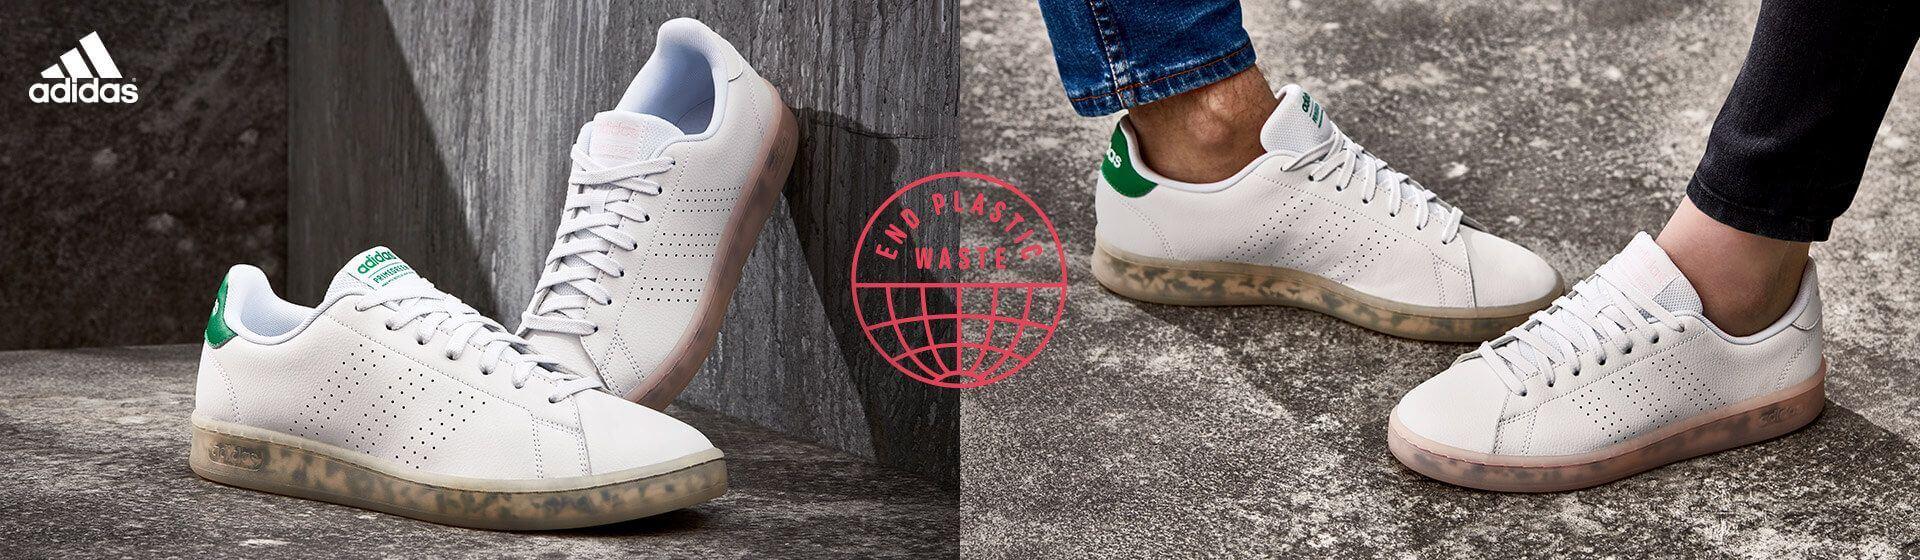 Weniger Plastik in adidas Sneaker